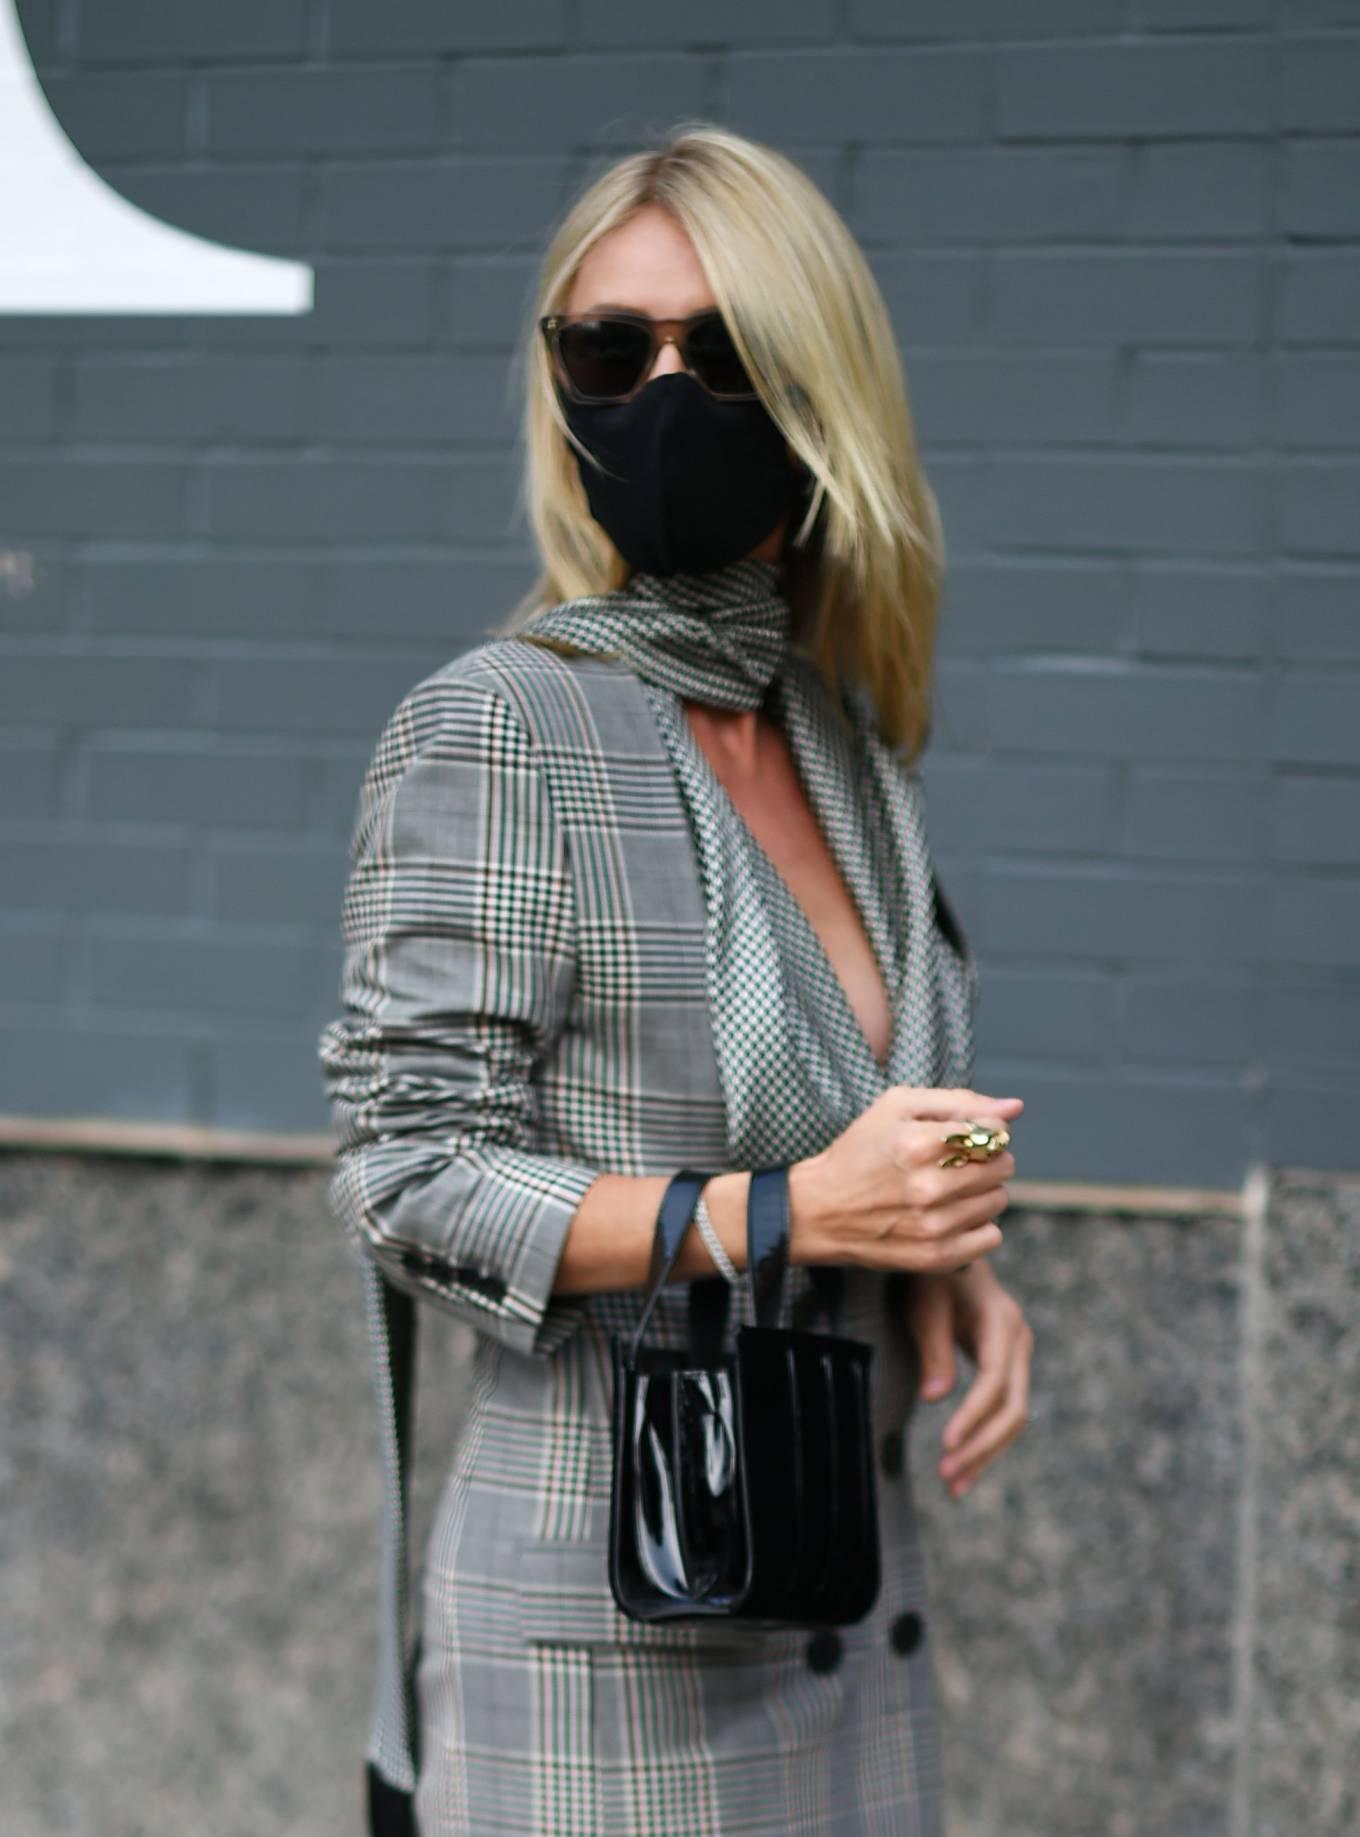 Nicky Hilton 2020 : Nicky Hilton – New York Fashion Week – Monse Fall-Winter 2020 Presentation-05